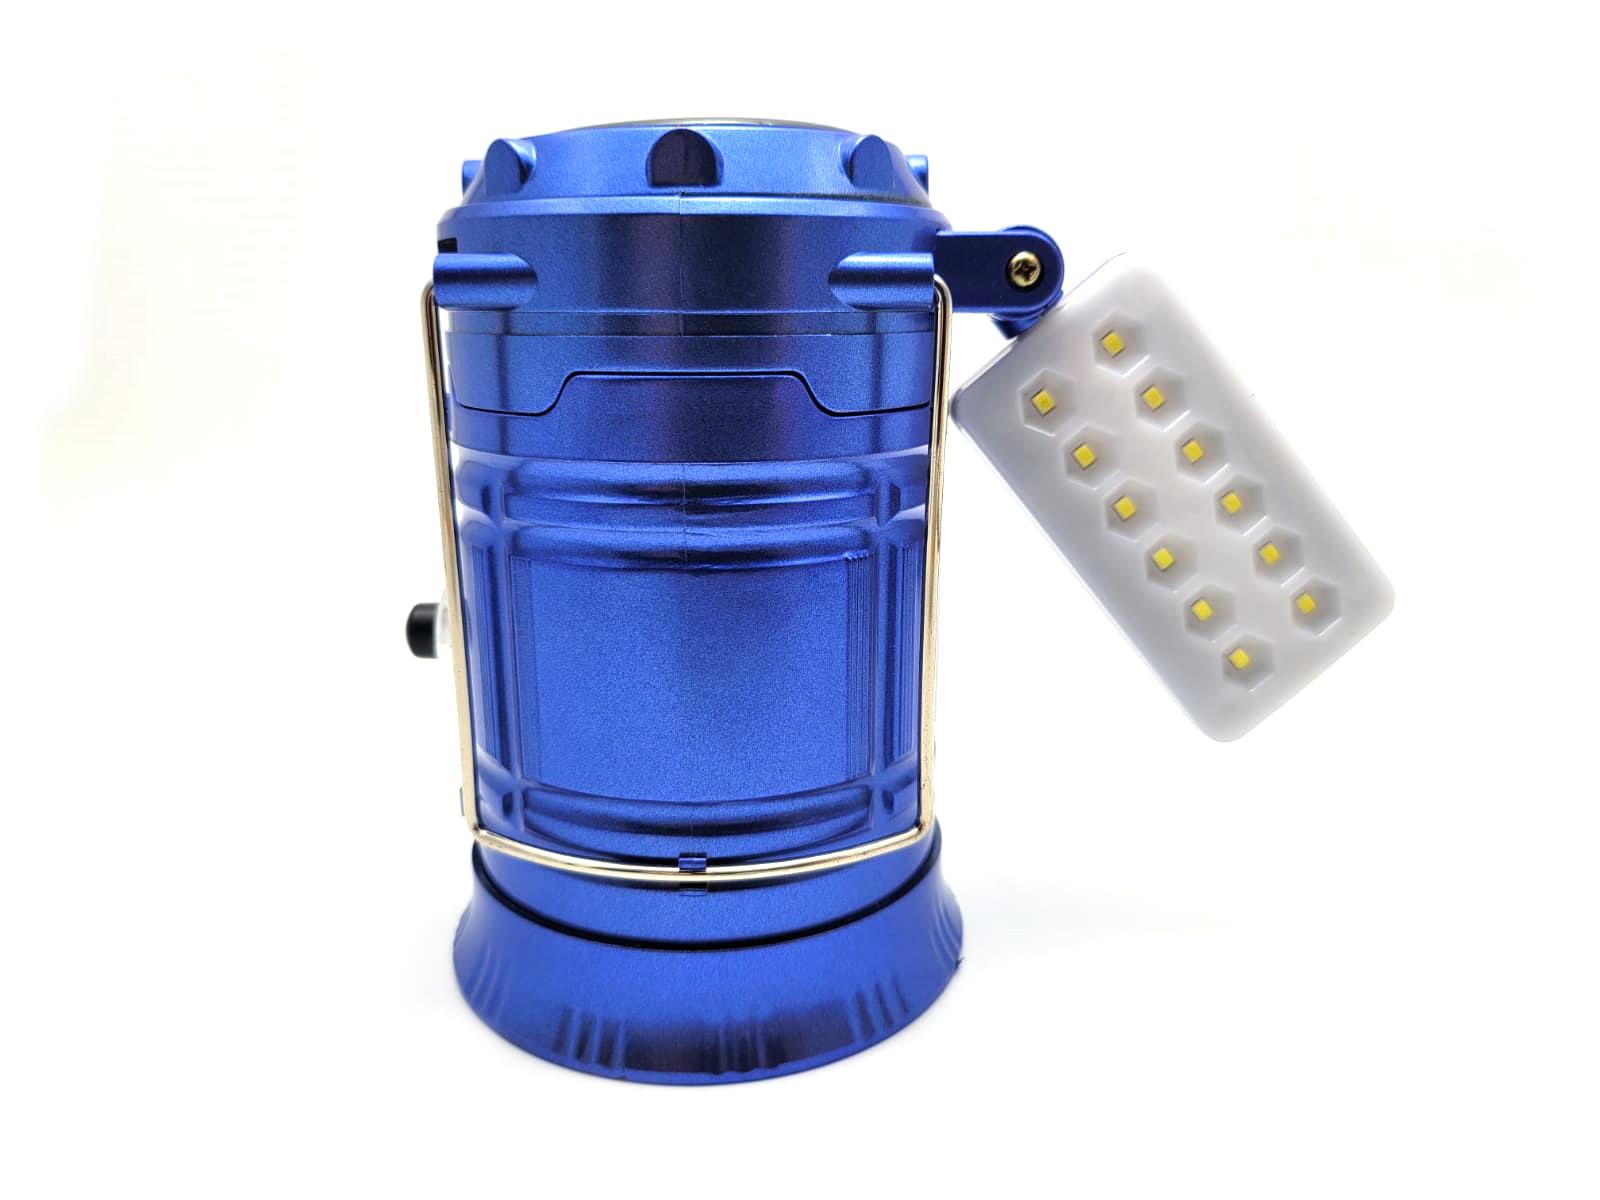 Felinar Reincarcabil MRG P-5888, Panou solar, Panou 12 LED, Albastru